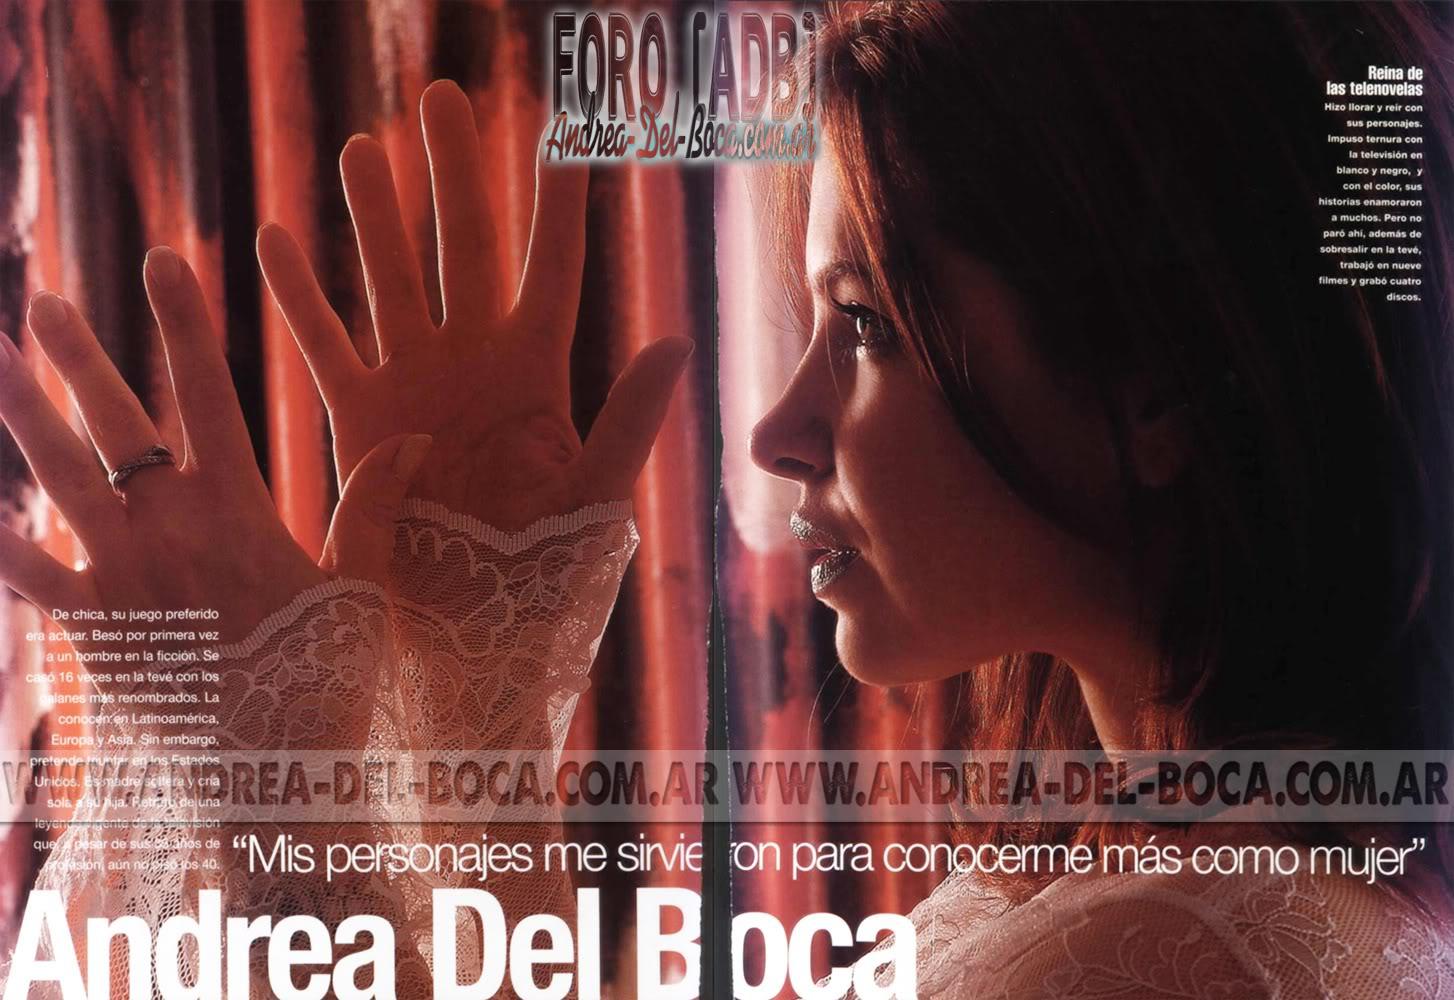 Фотографии / Fotos (часть 4) - Página 7 2004Andrea01